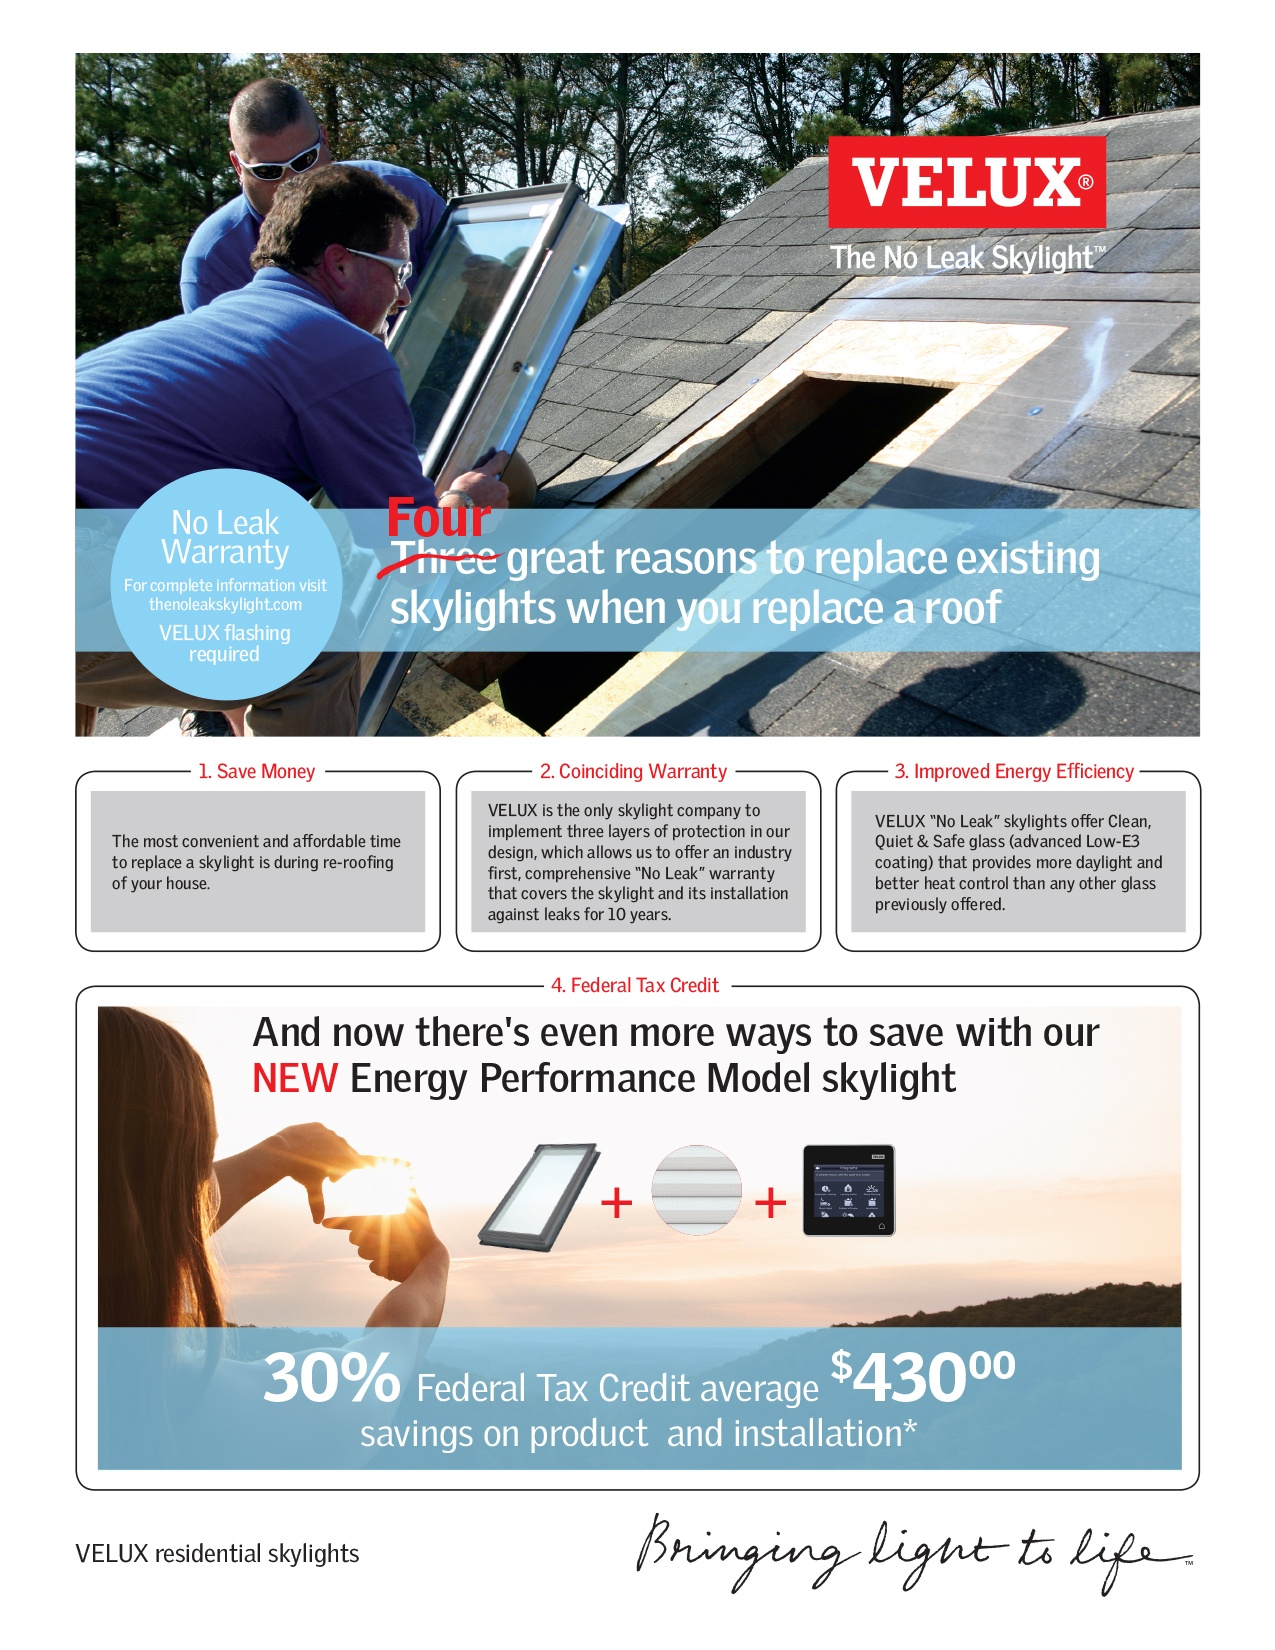 4-reasons-to-replace-skylights.jpg